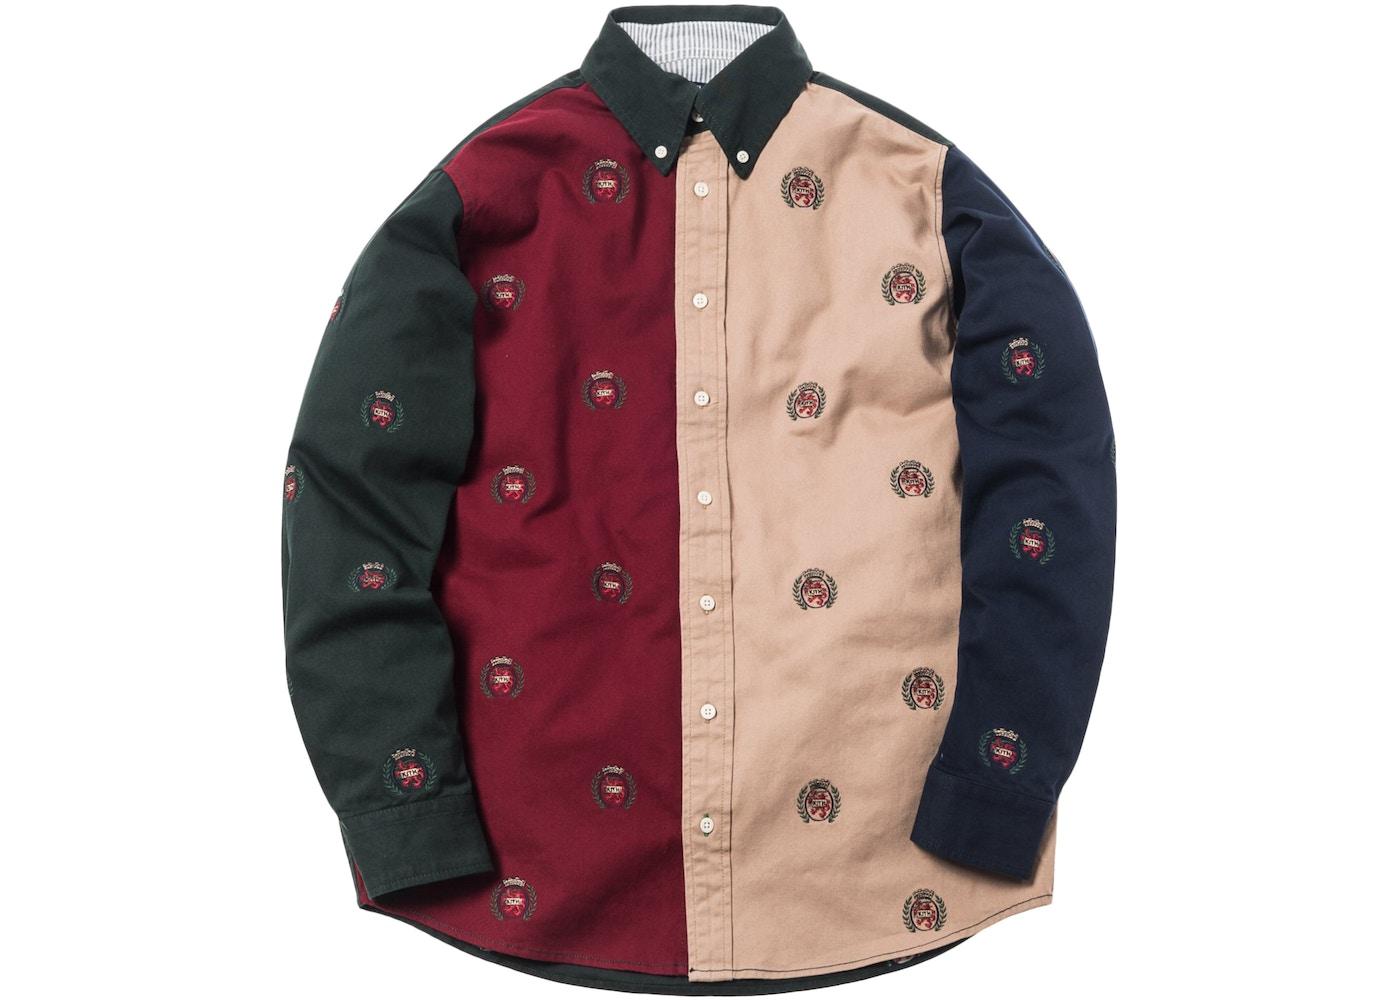 7e281f8f Kith x Tommy Hilfiger Twill Woven Shirt Multi - FW18